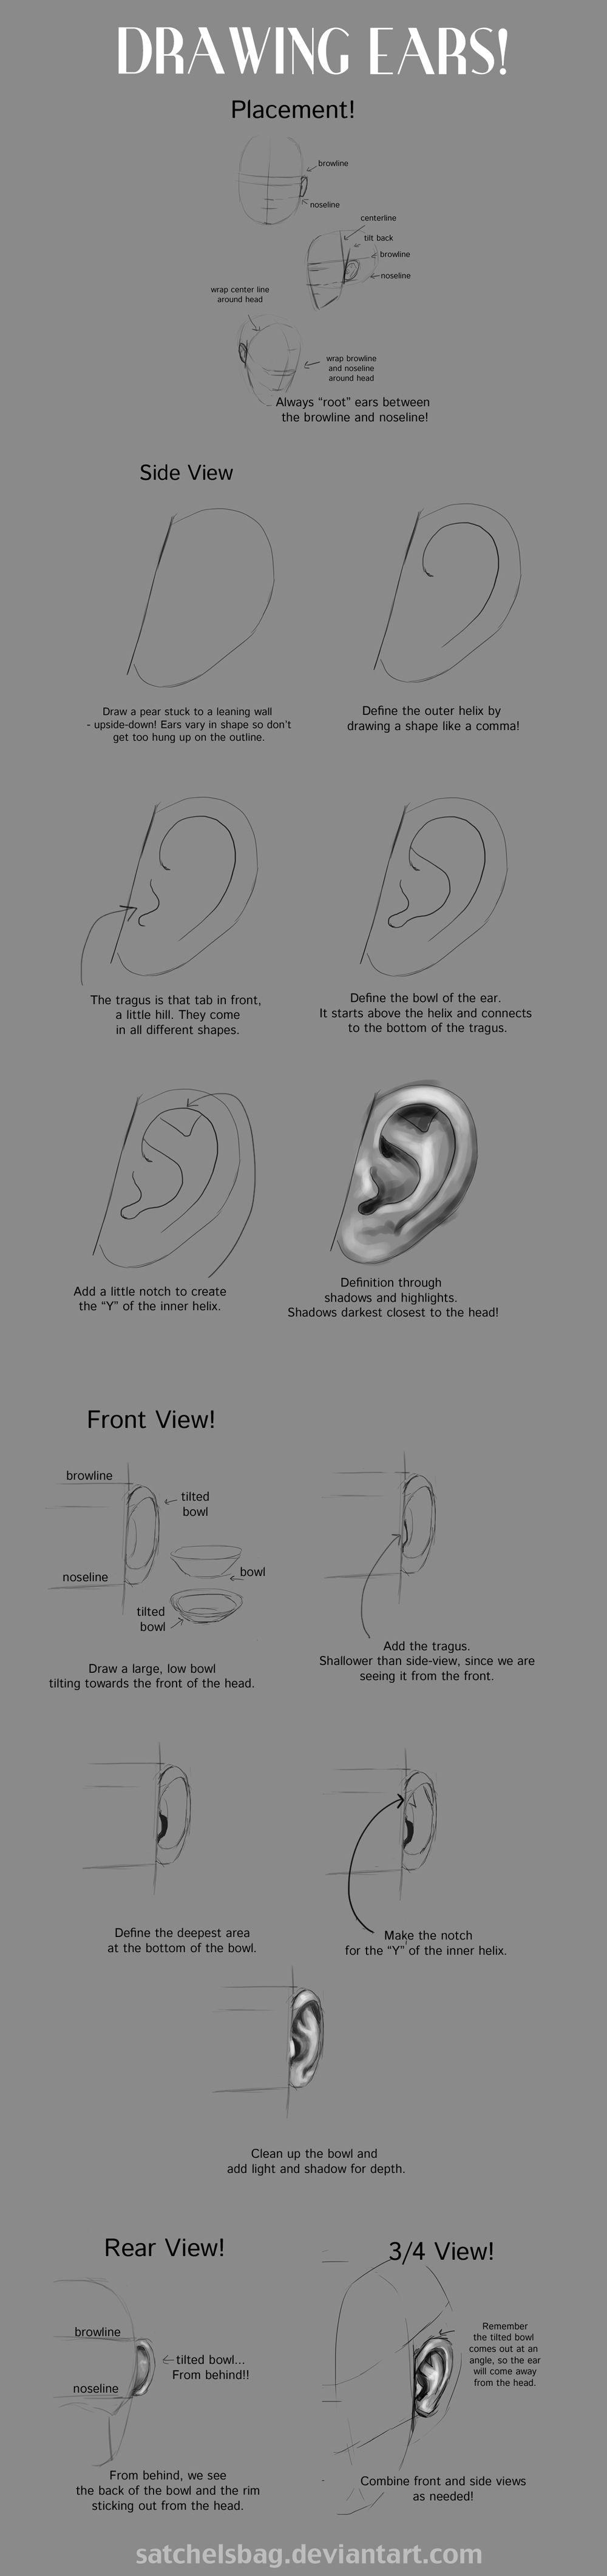 Drawing Ears Tutorial by DianetheKraus.deviantart.com on @deviantART